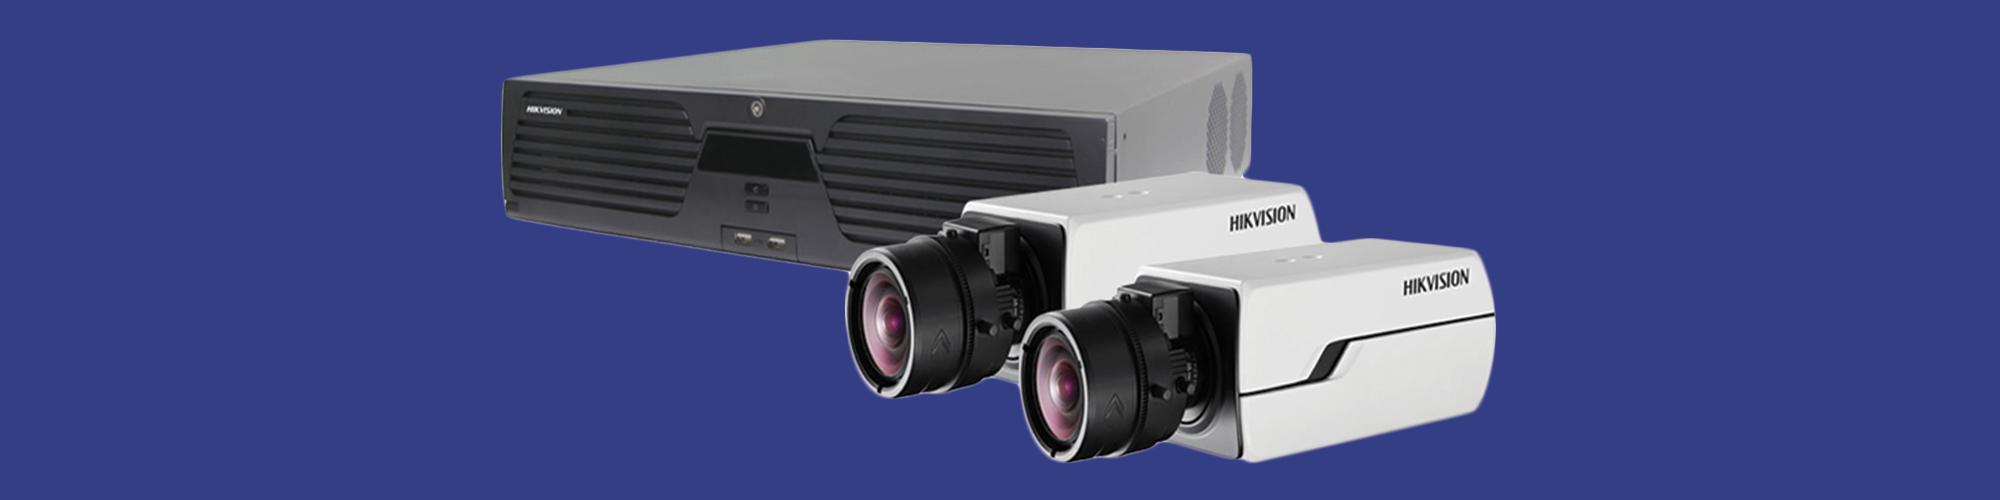 Hikvision introduce 4K surveillance